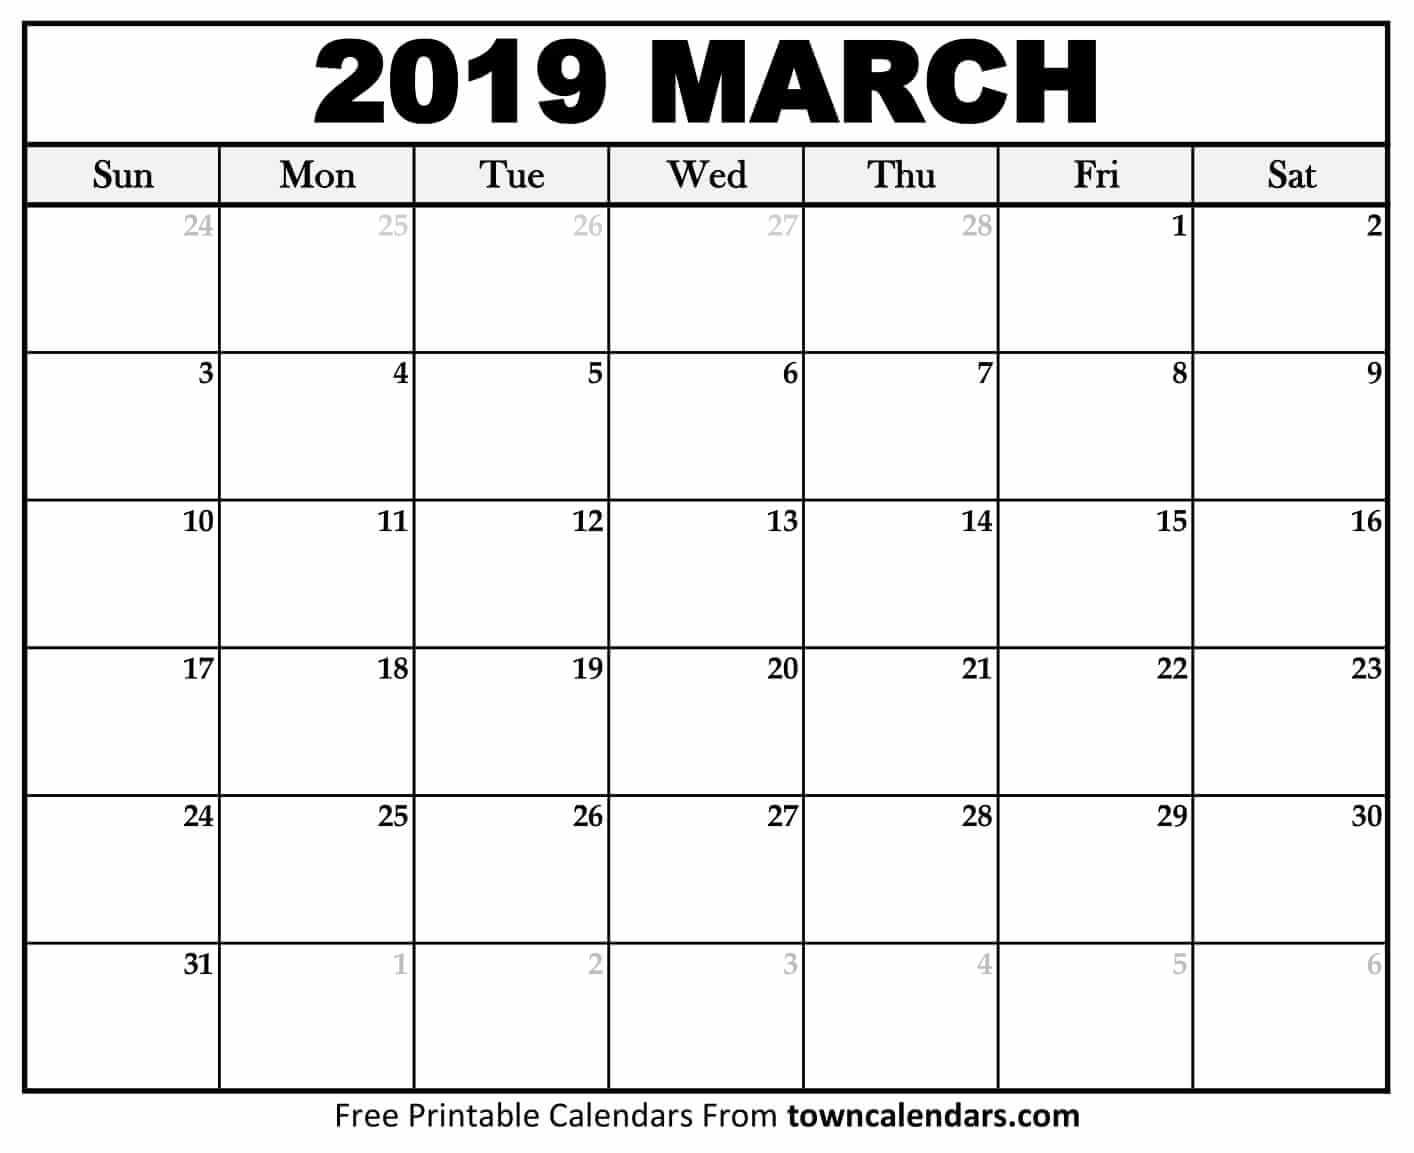 2019 March Calendar PDF